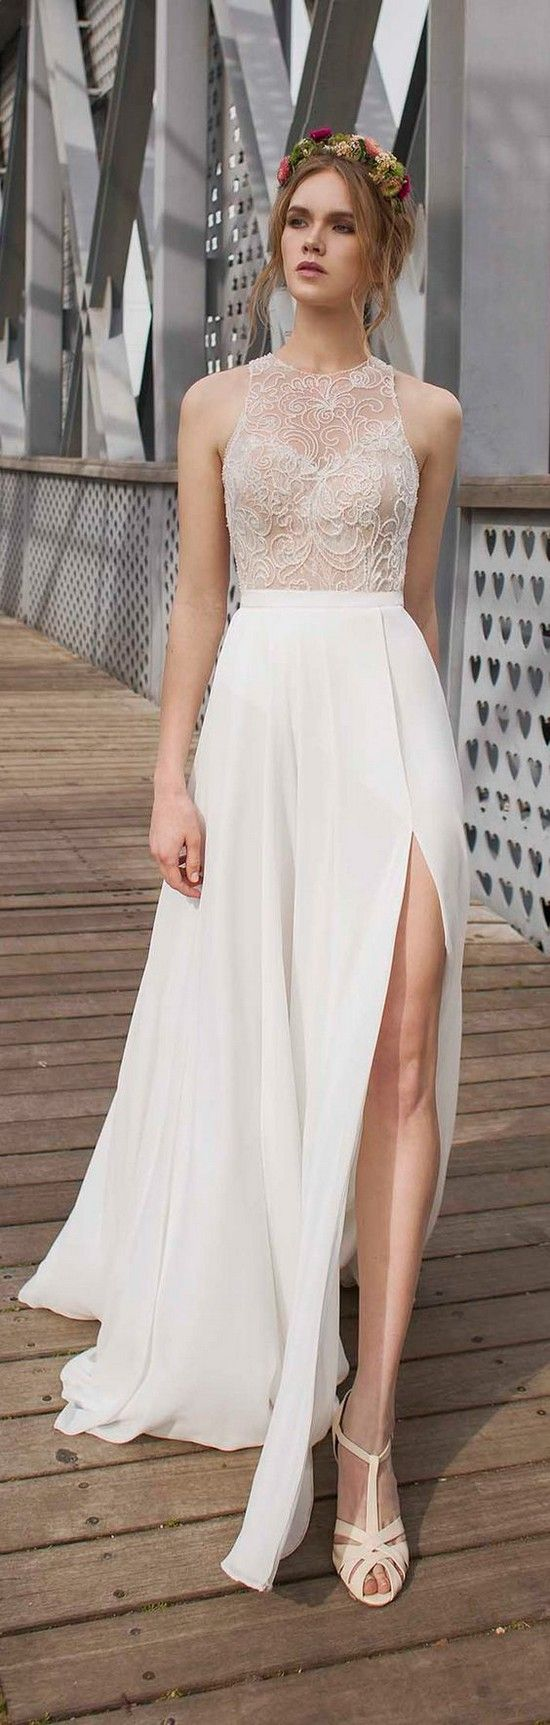 Modern dress advantages - Top 20 Beach Wedding Dresses With Gorgeous Details